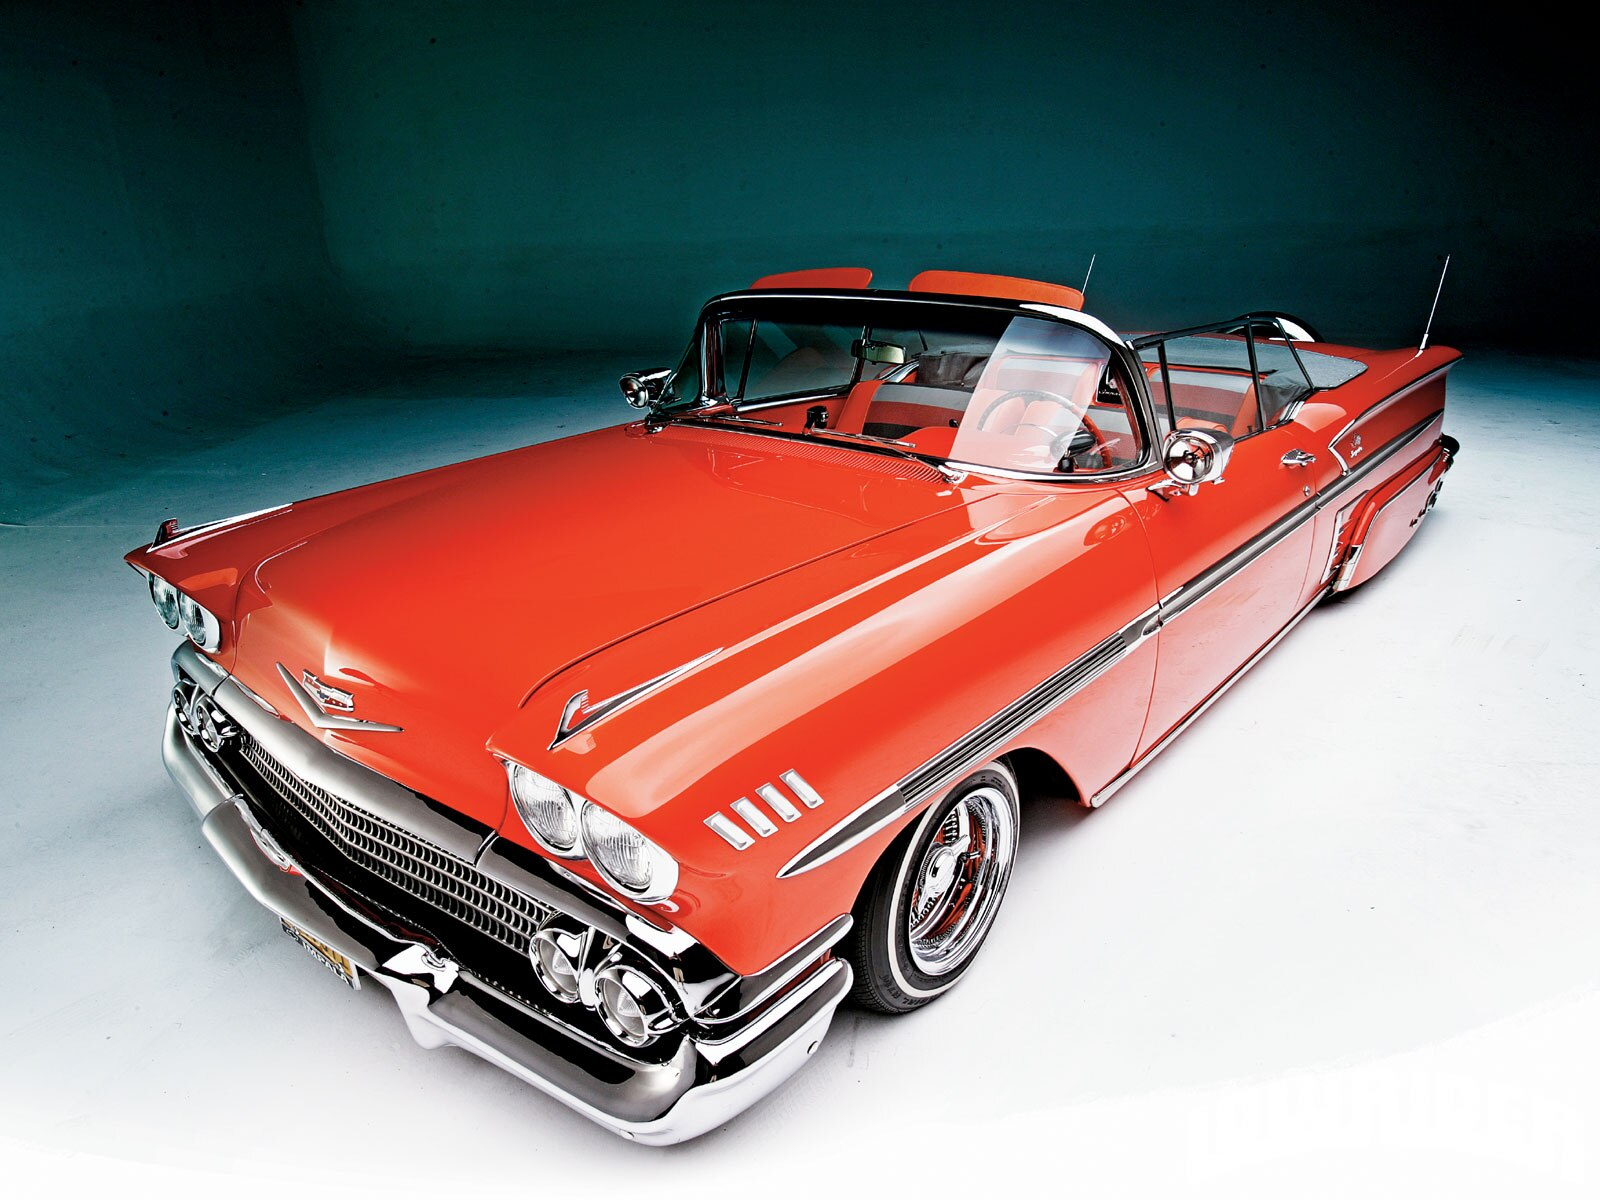 lrmp-1003-02-o-1958-chevrolet-impala-convertible-front-left2